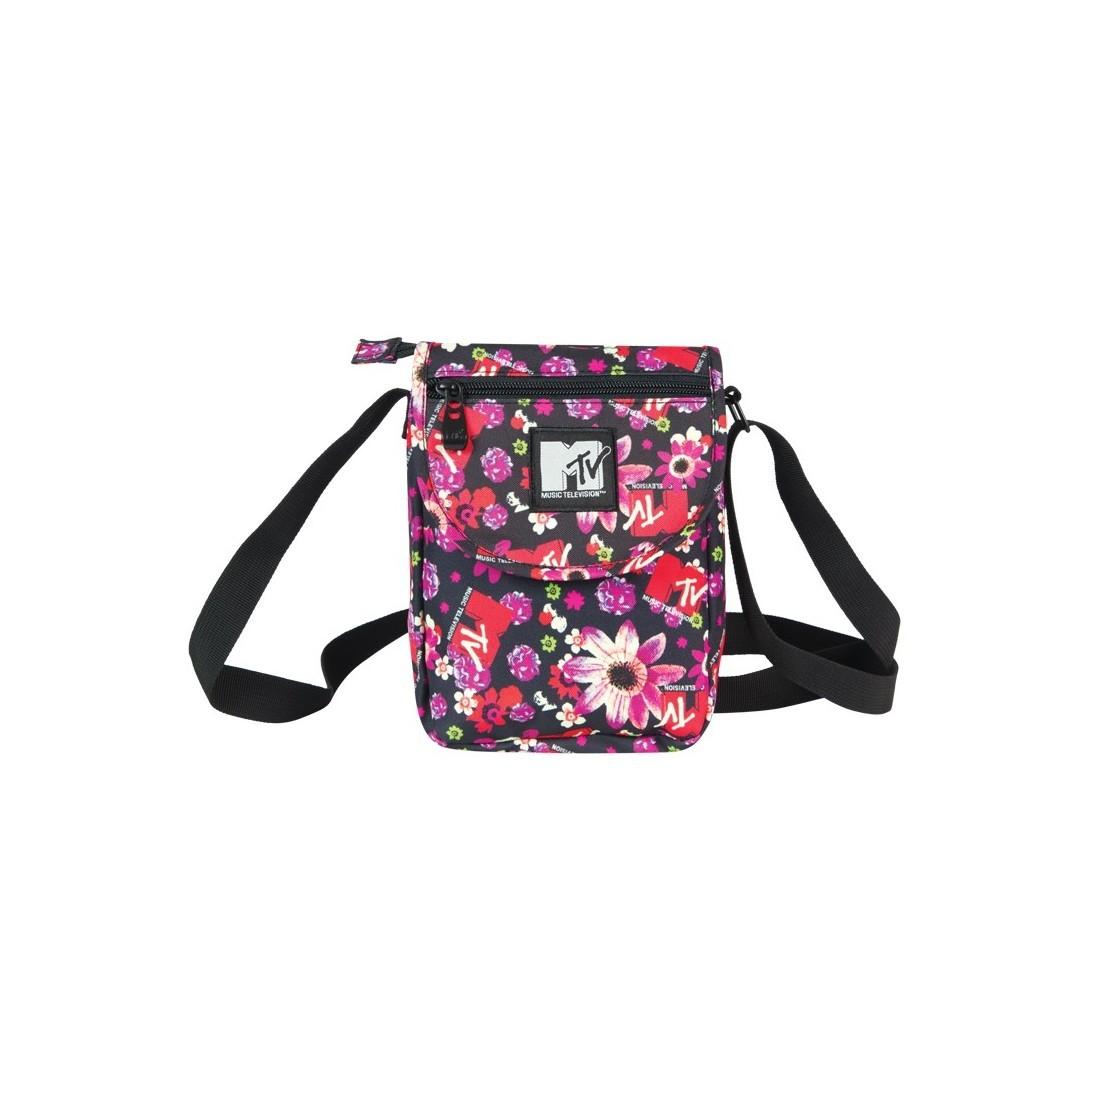 Mała torebka na ramię Coolpack Mtv Flowers - plecak-tornister.pl